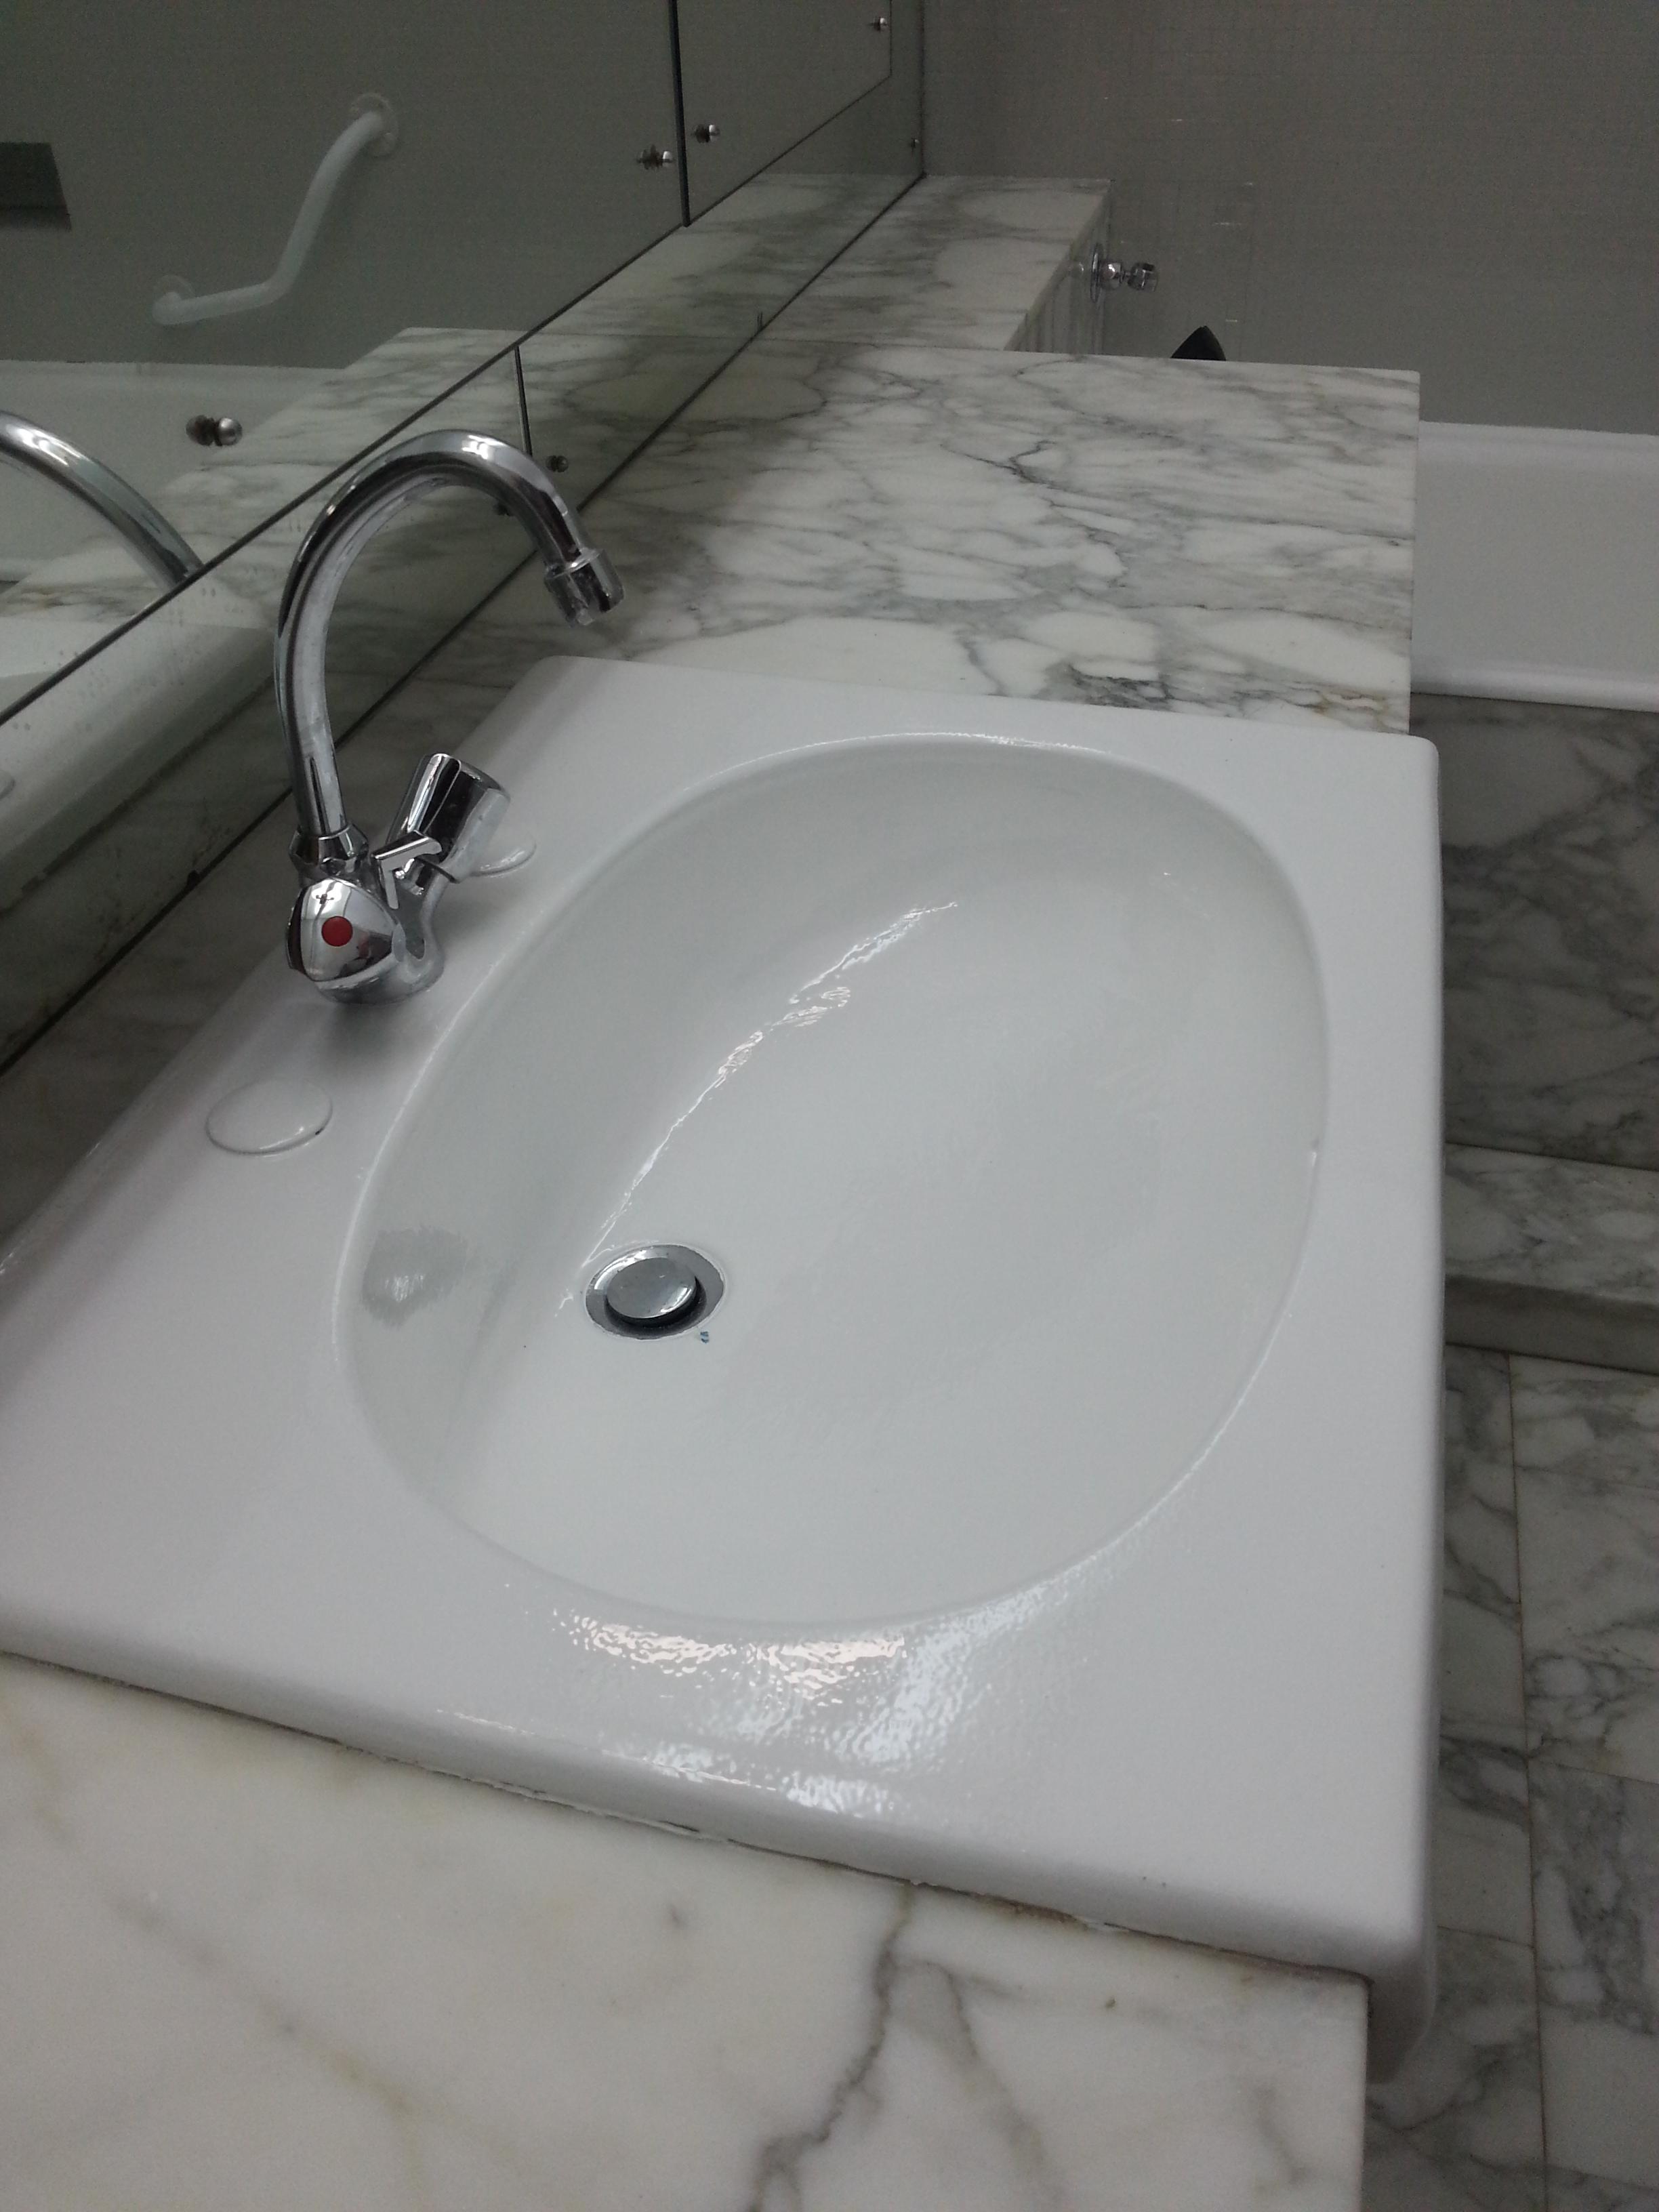 Peinture brillante pour salle de bain